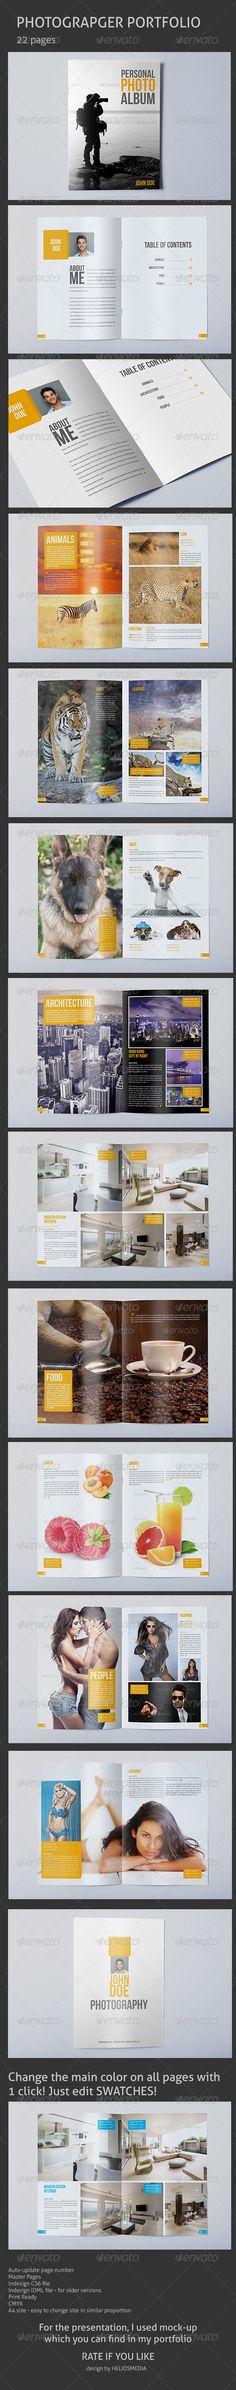 Print Templates - Photographer Portfolio / Album | GraphicRiver